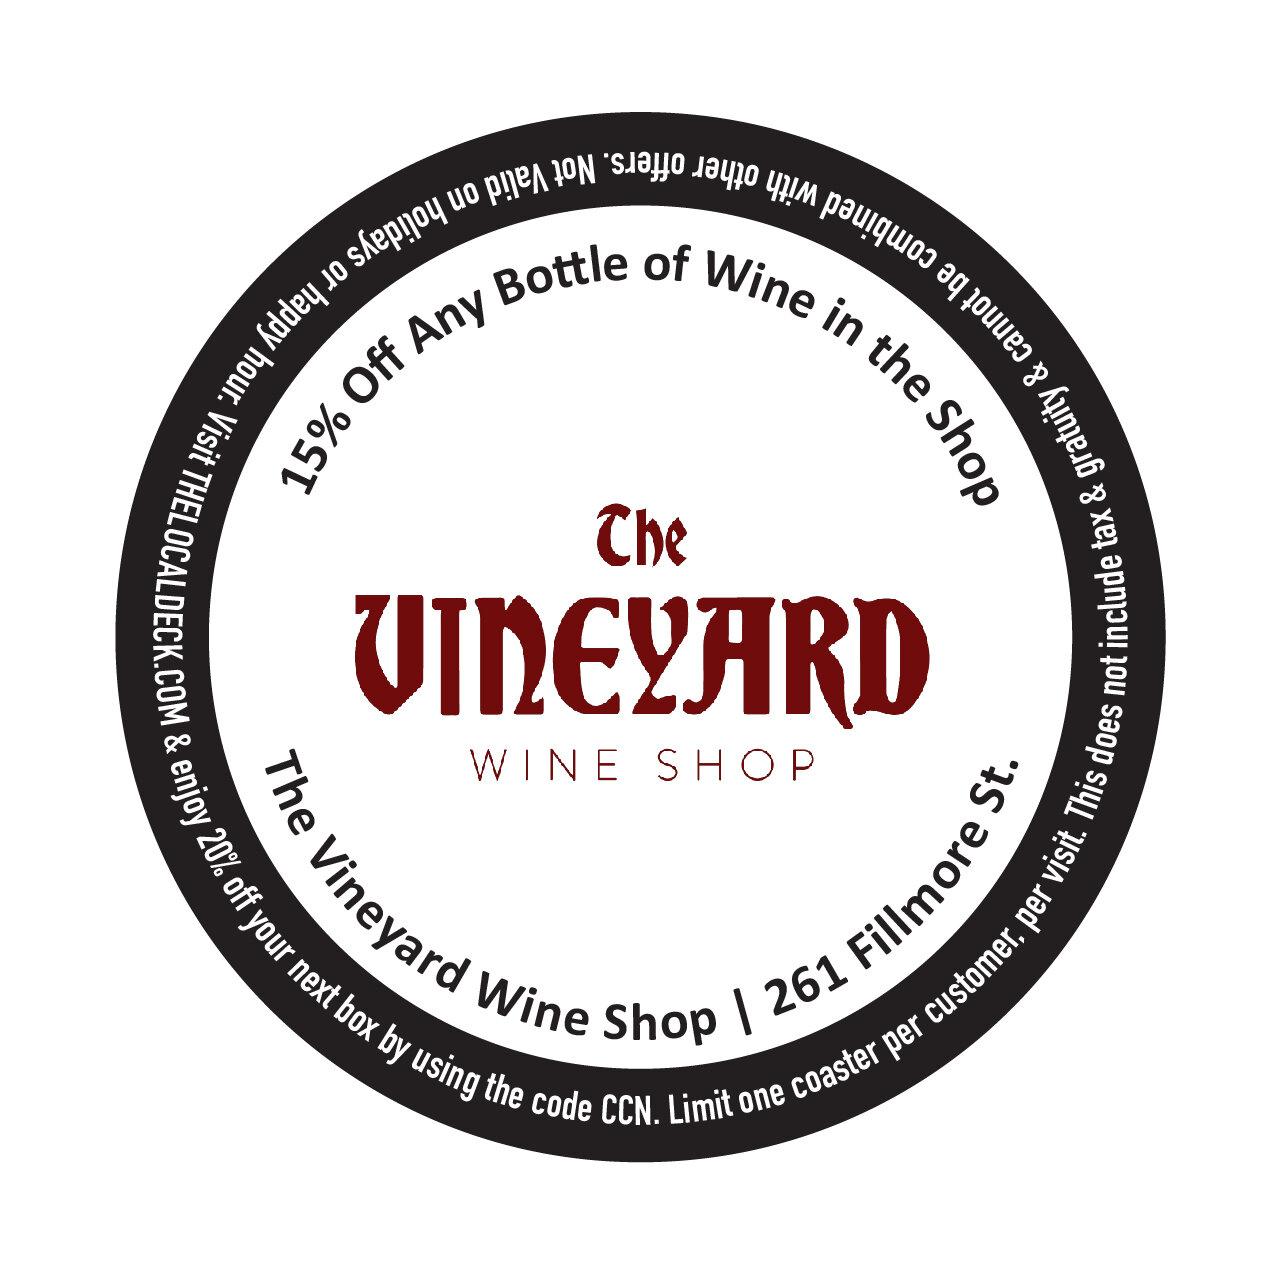 The Vineyard Wine Shop.jpg